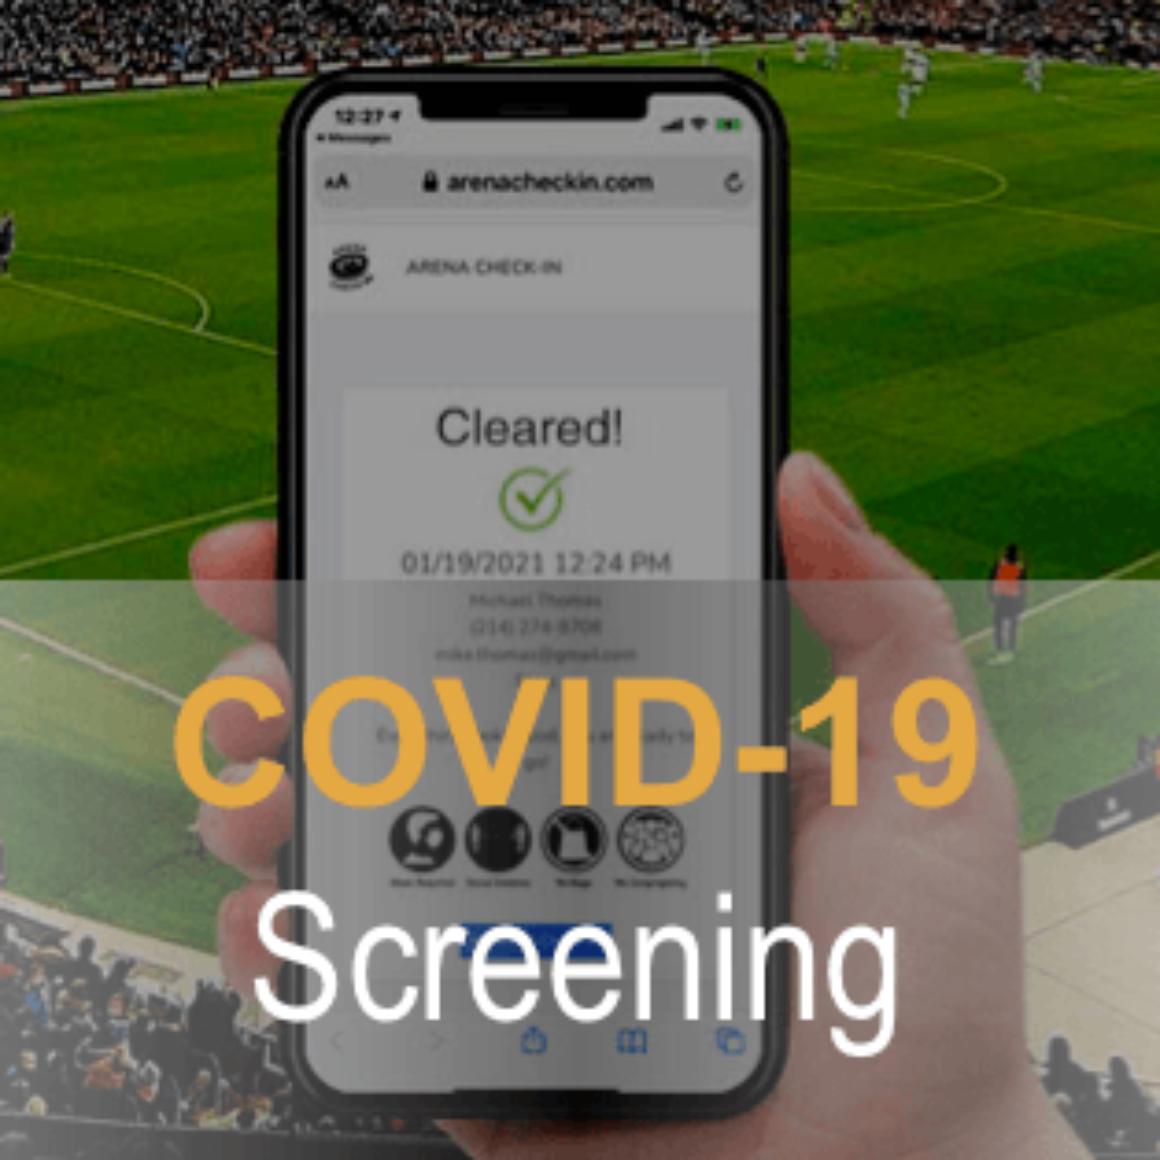 COVID 19 Screening